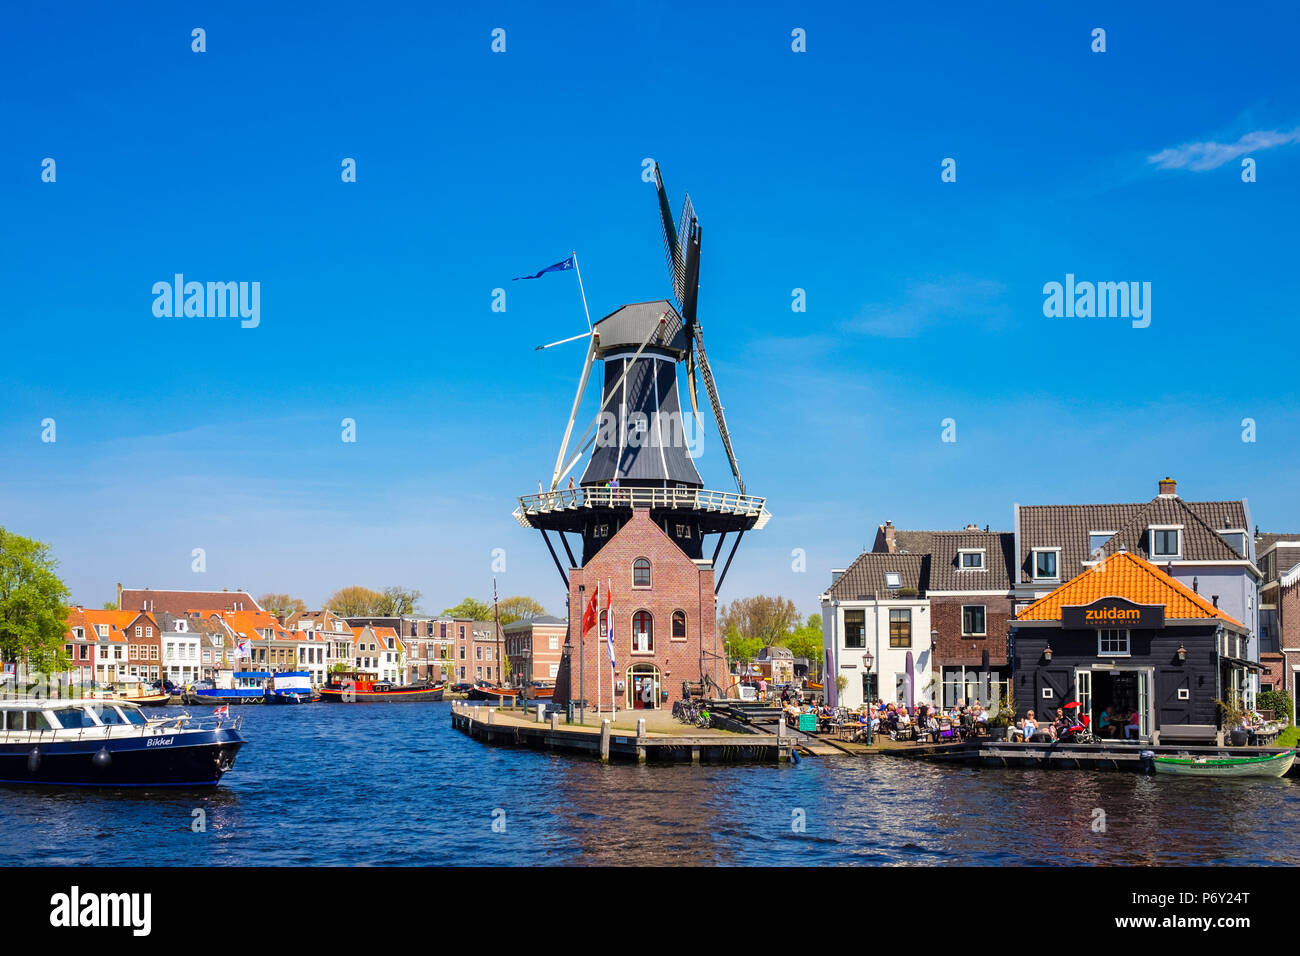 Netherlands, North Holland, Haarlem. Windmill De Adriaan on the Spaarne River. - Stock Image